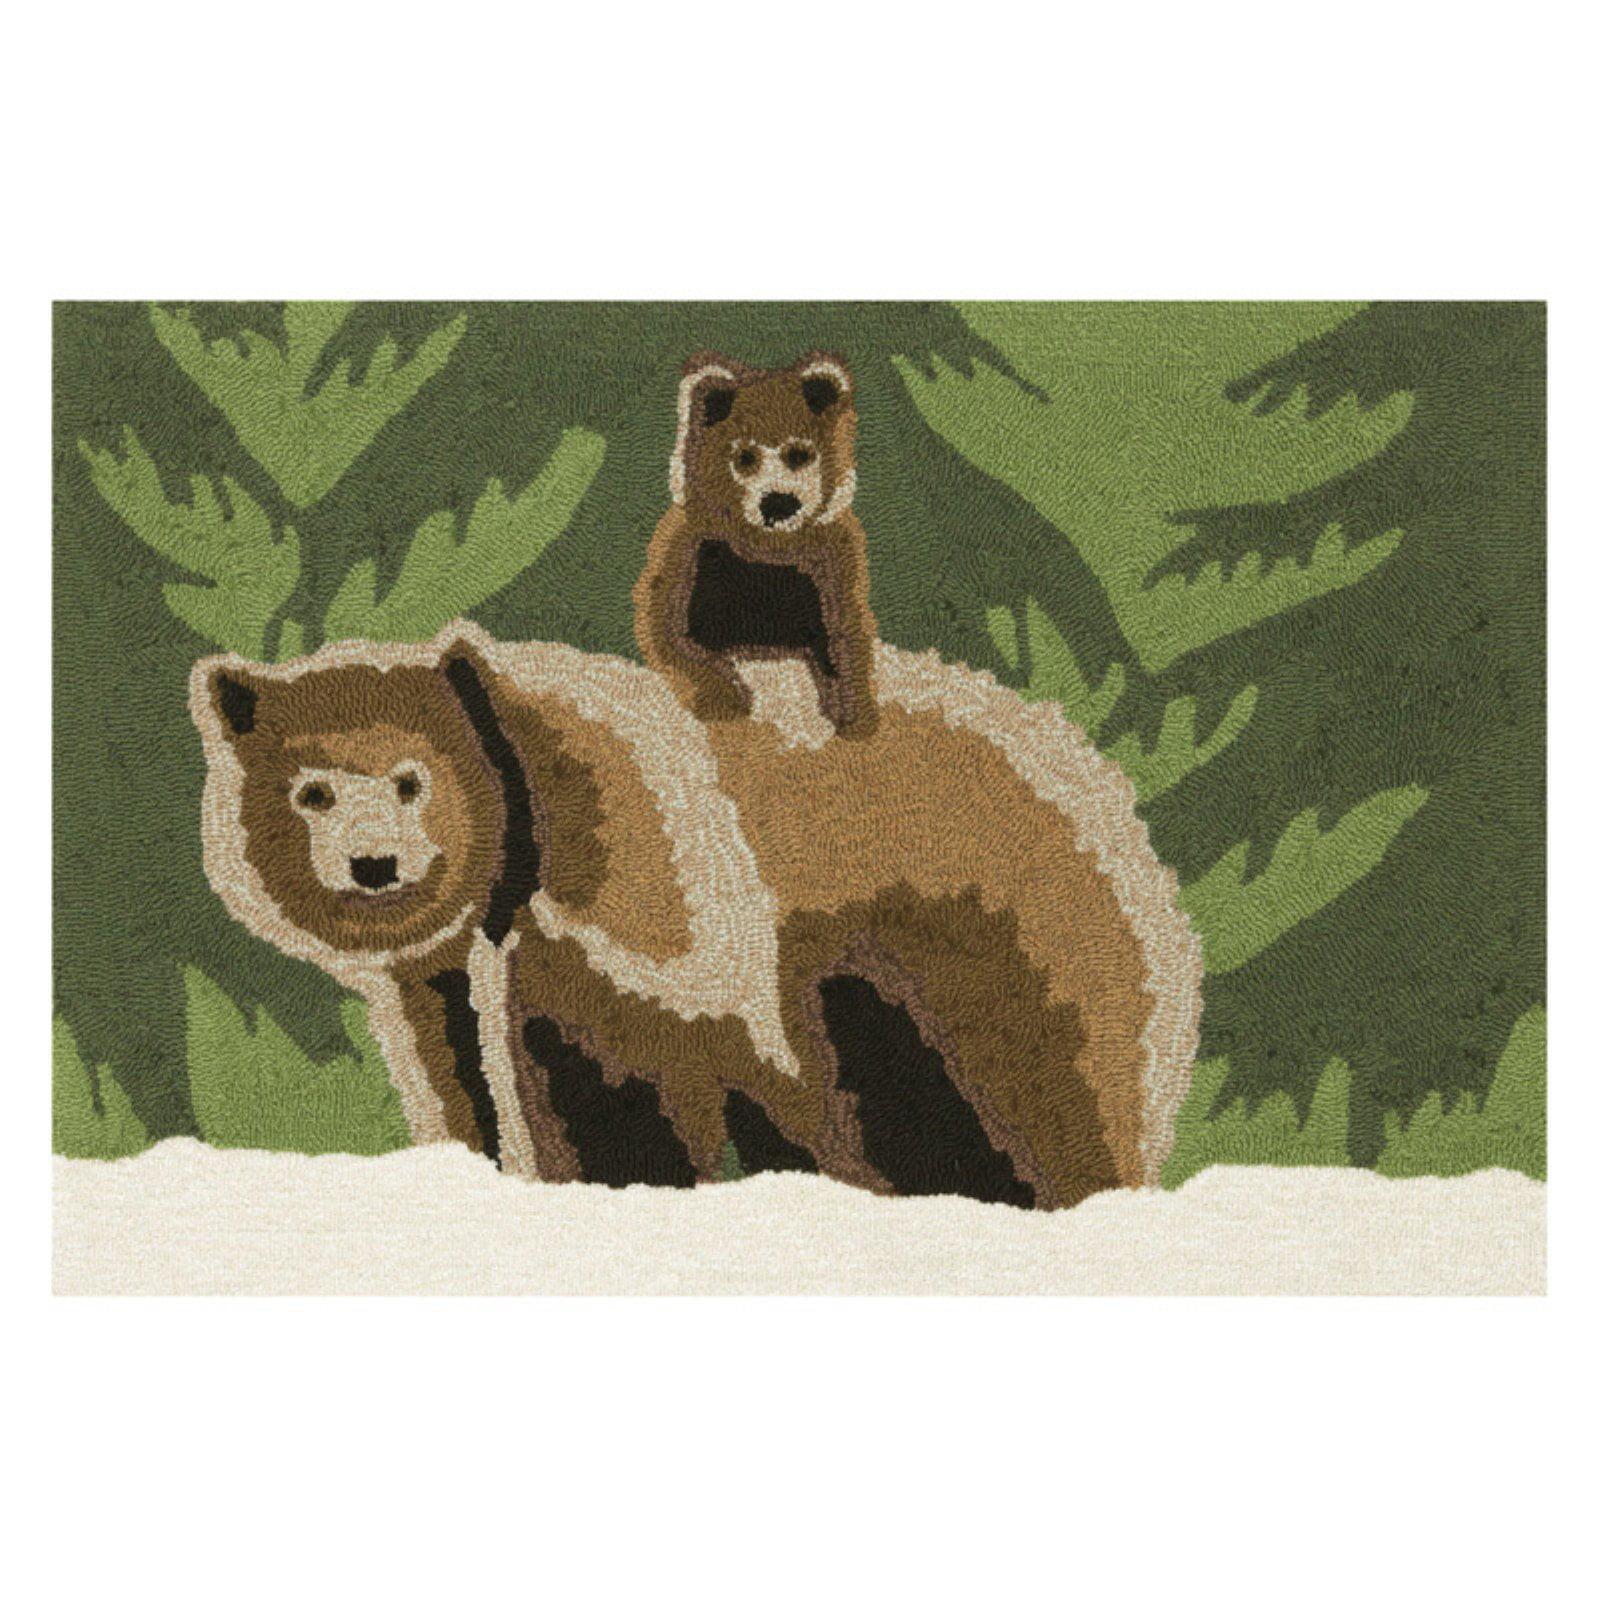 Trans-Ocean Rug Frontporch Bear Family Green Indoor/Outdoor Area Rug